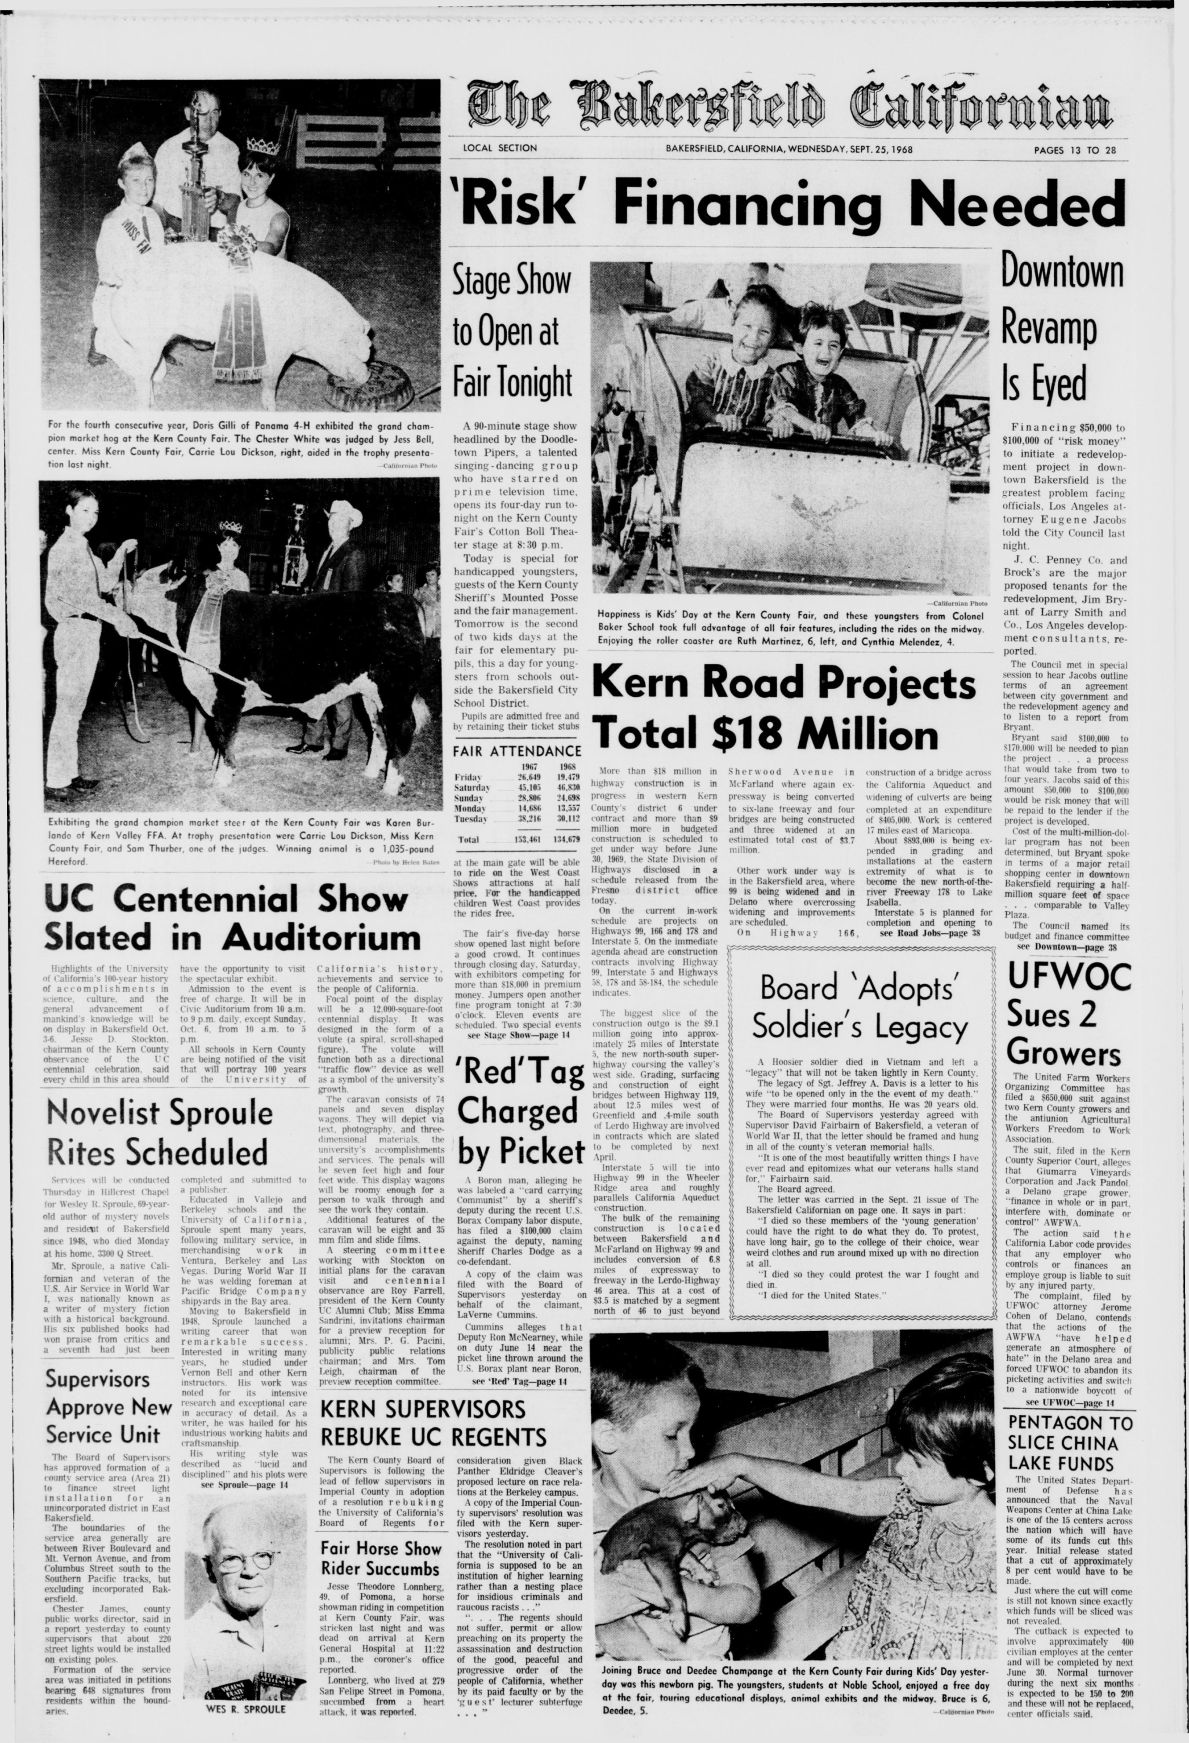 TBC Time Capsule: Sept. 25, 1968